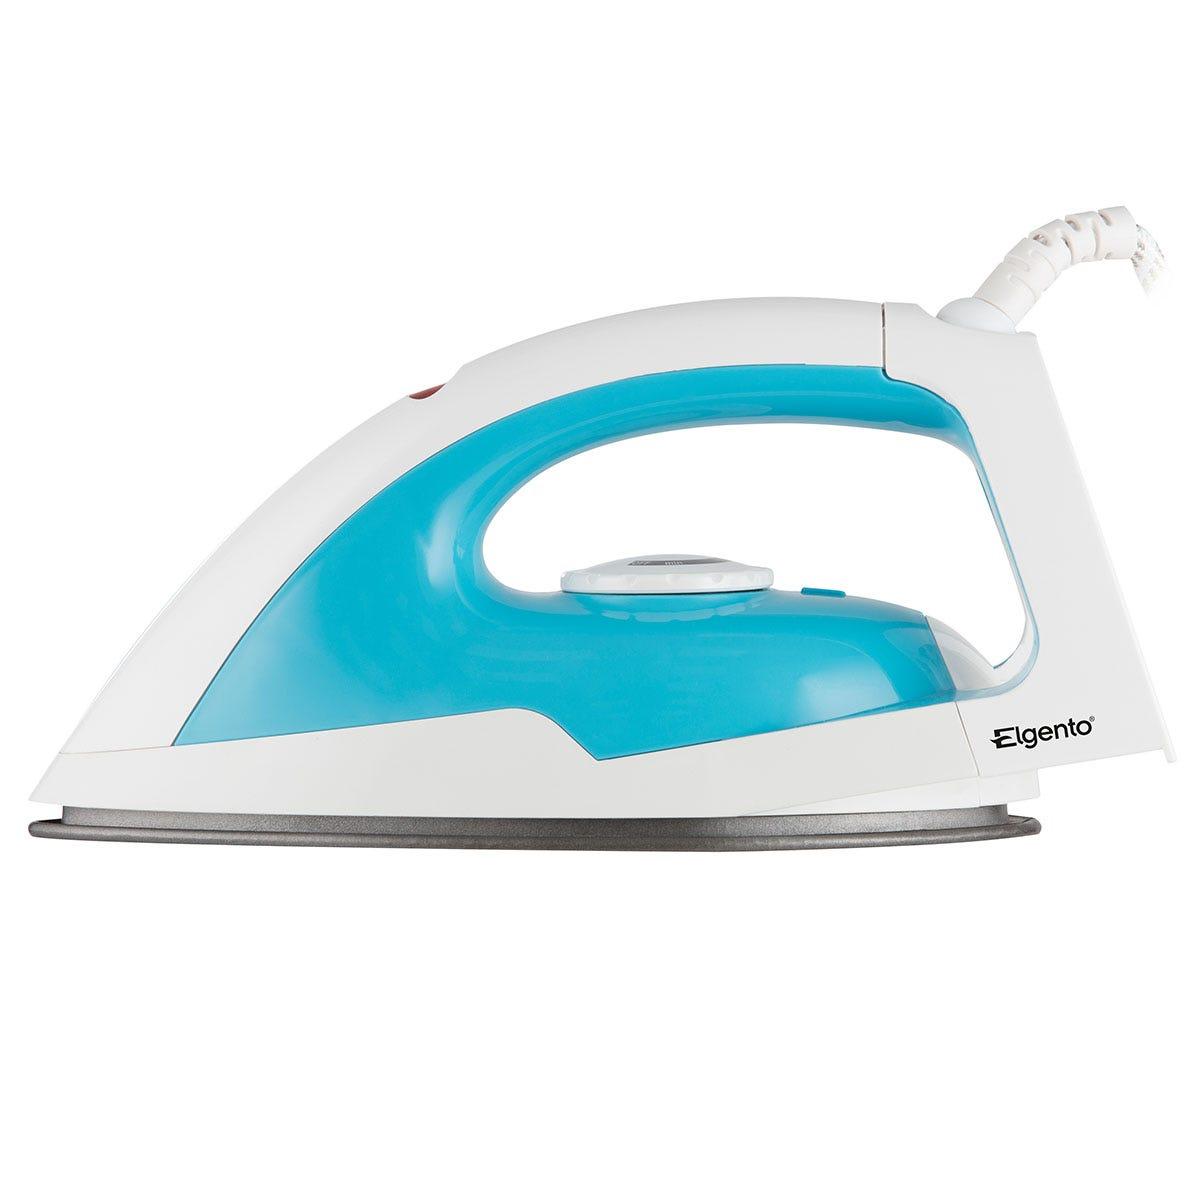 Image of Elgento 1200W Dry Iron - Blue